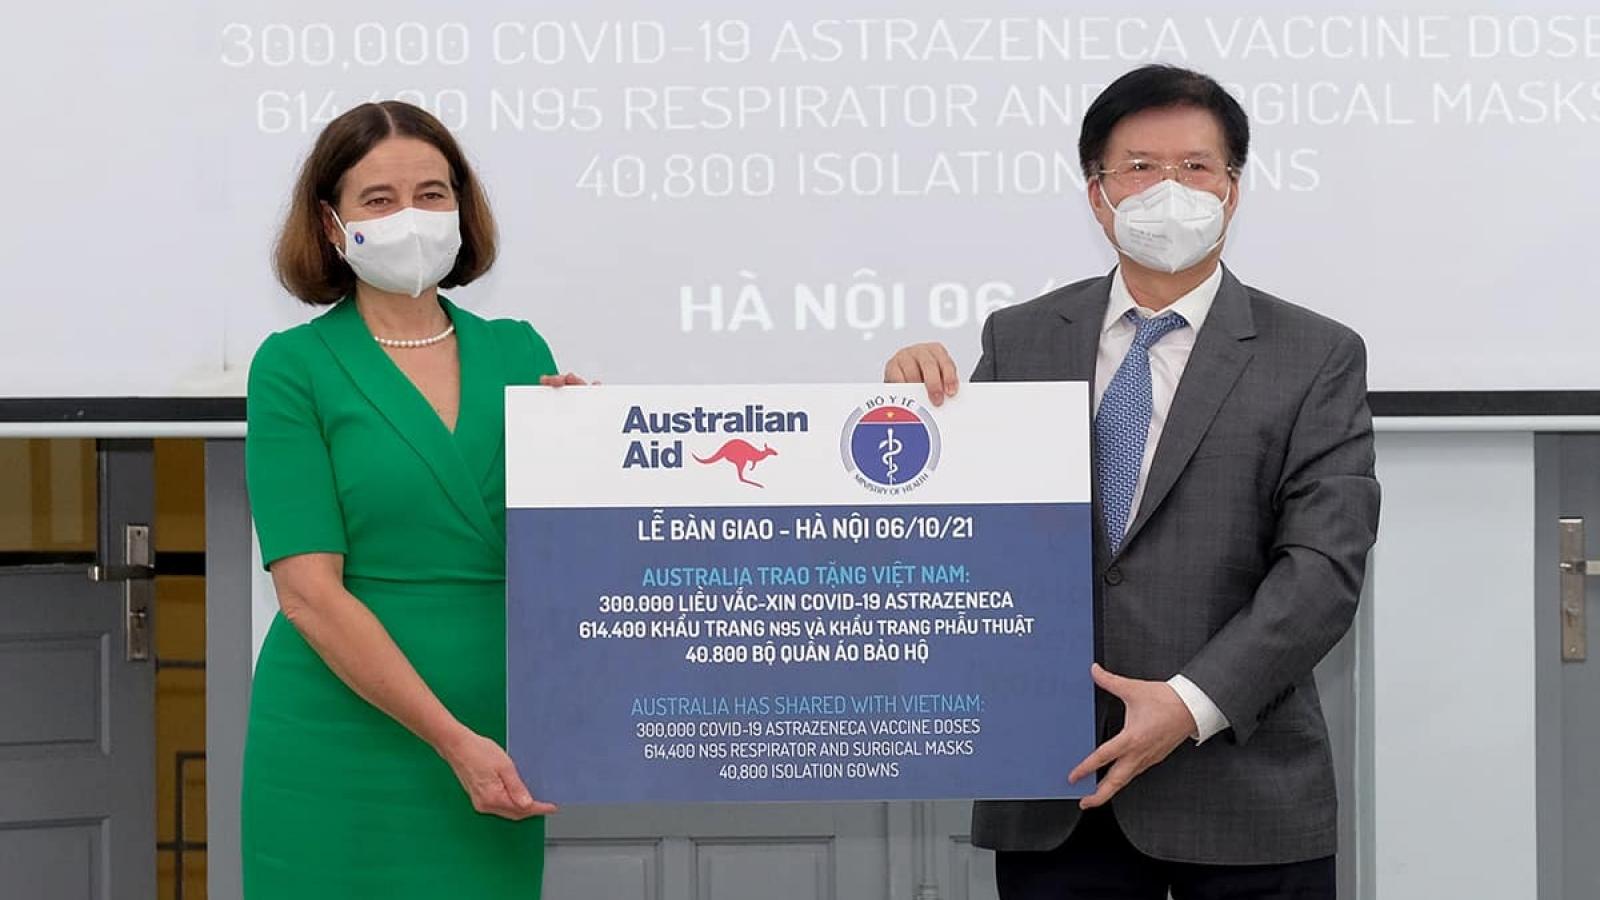 Bộ Y tế tiếp nhận thêm 300.000 liều vaccine COVID-19 từ Australia